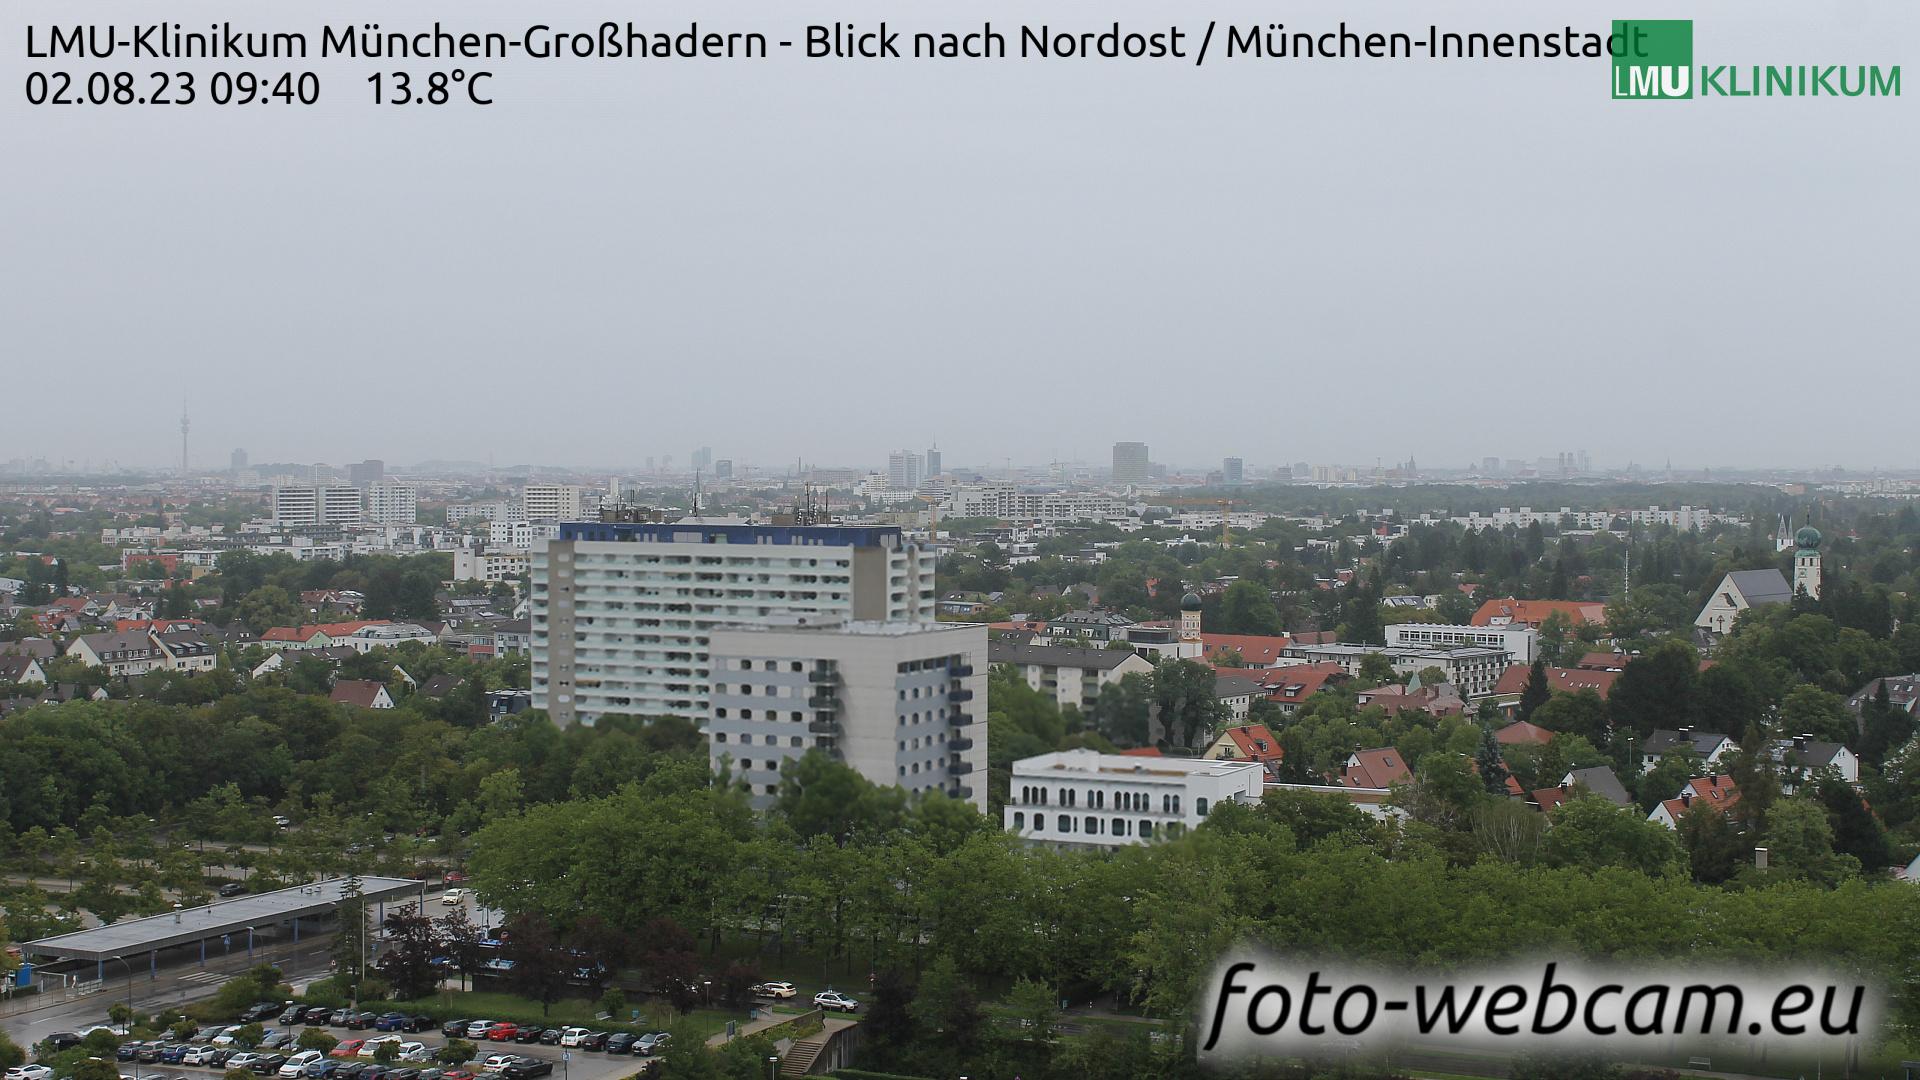 Munich Mon. 09:47